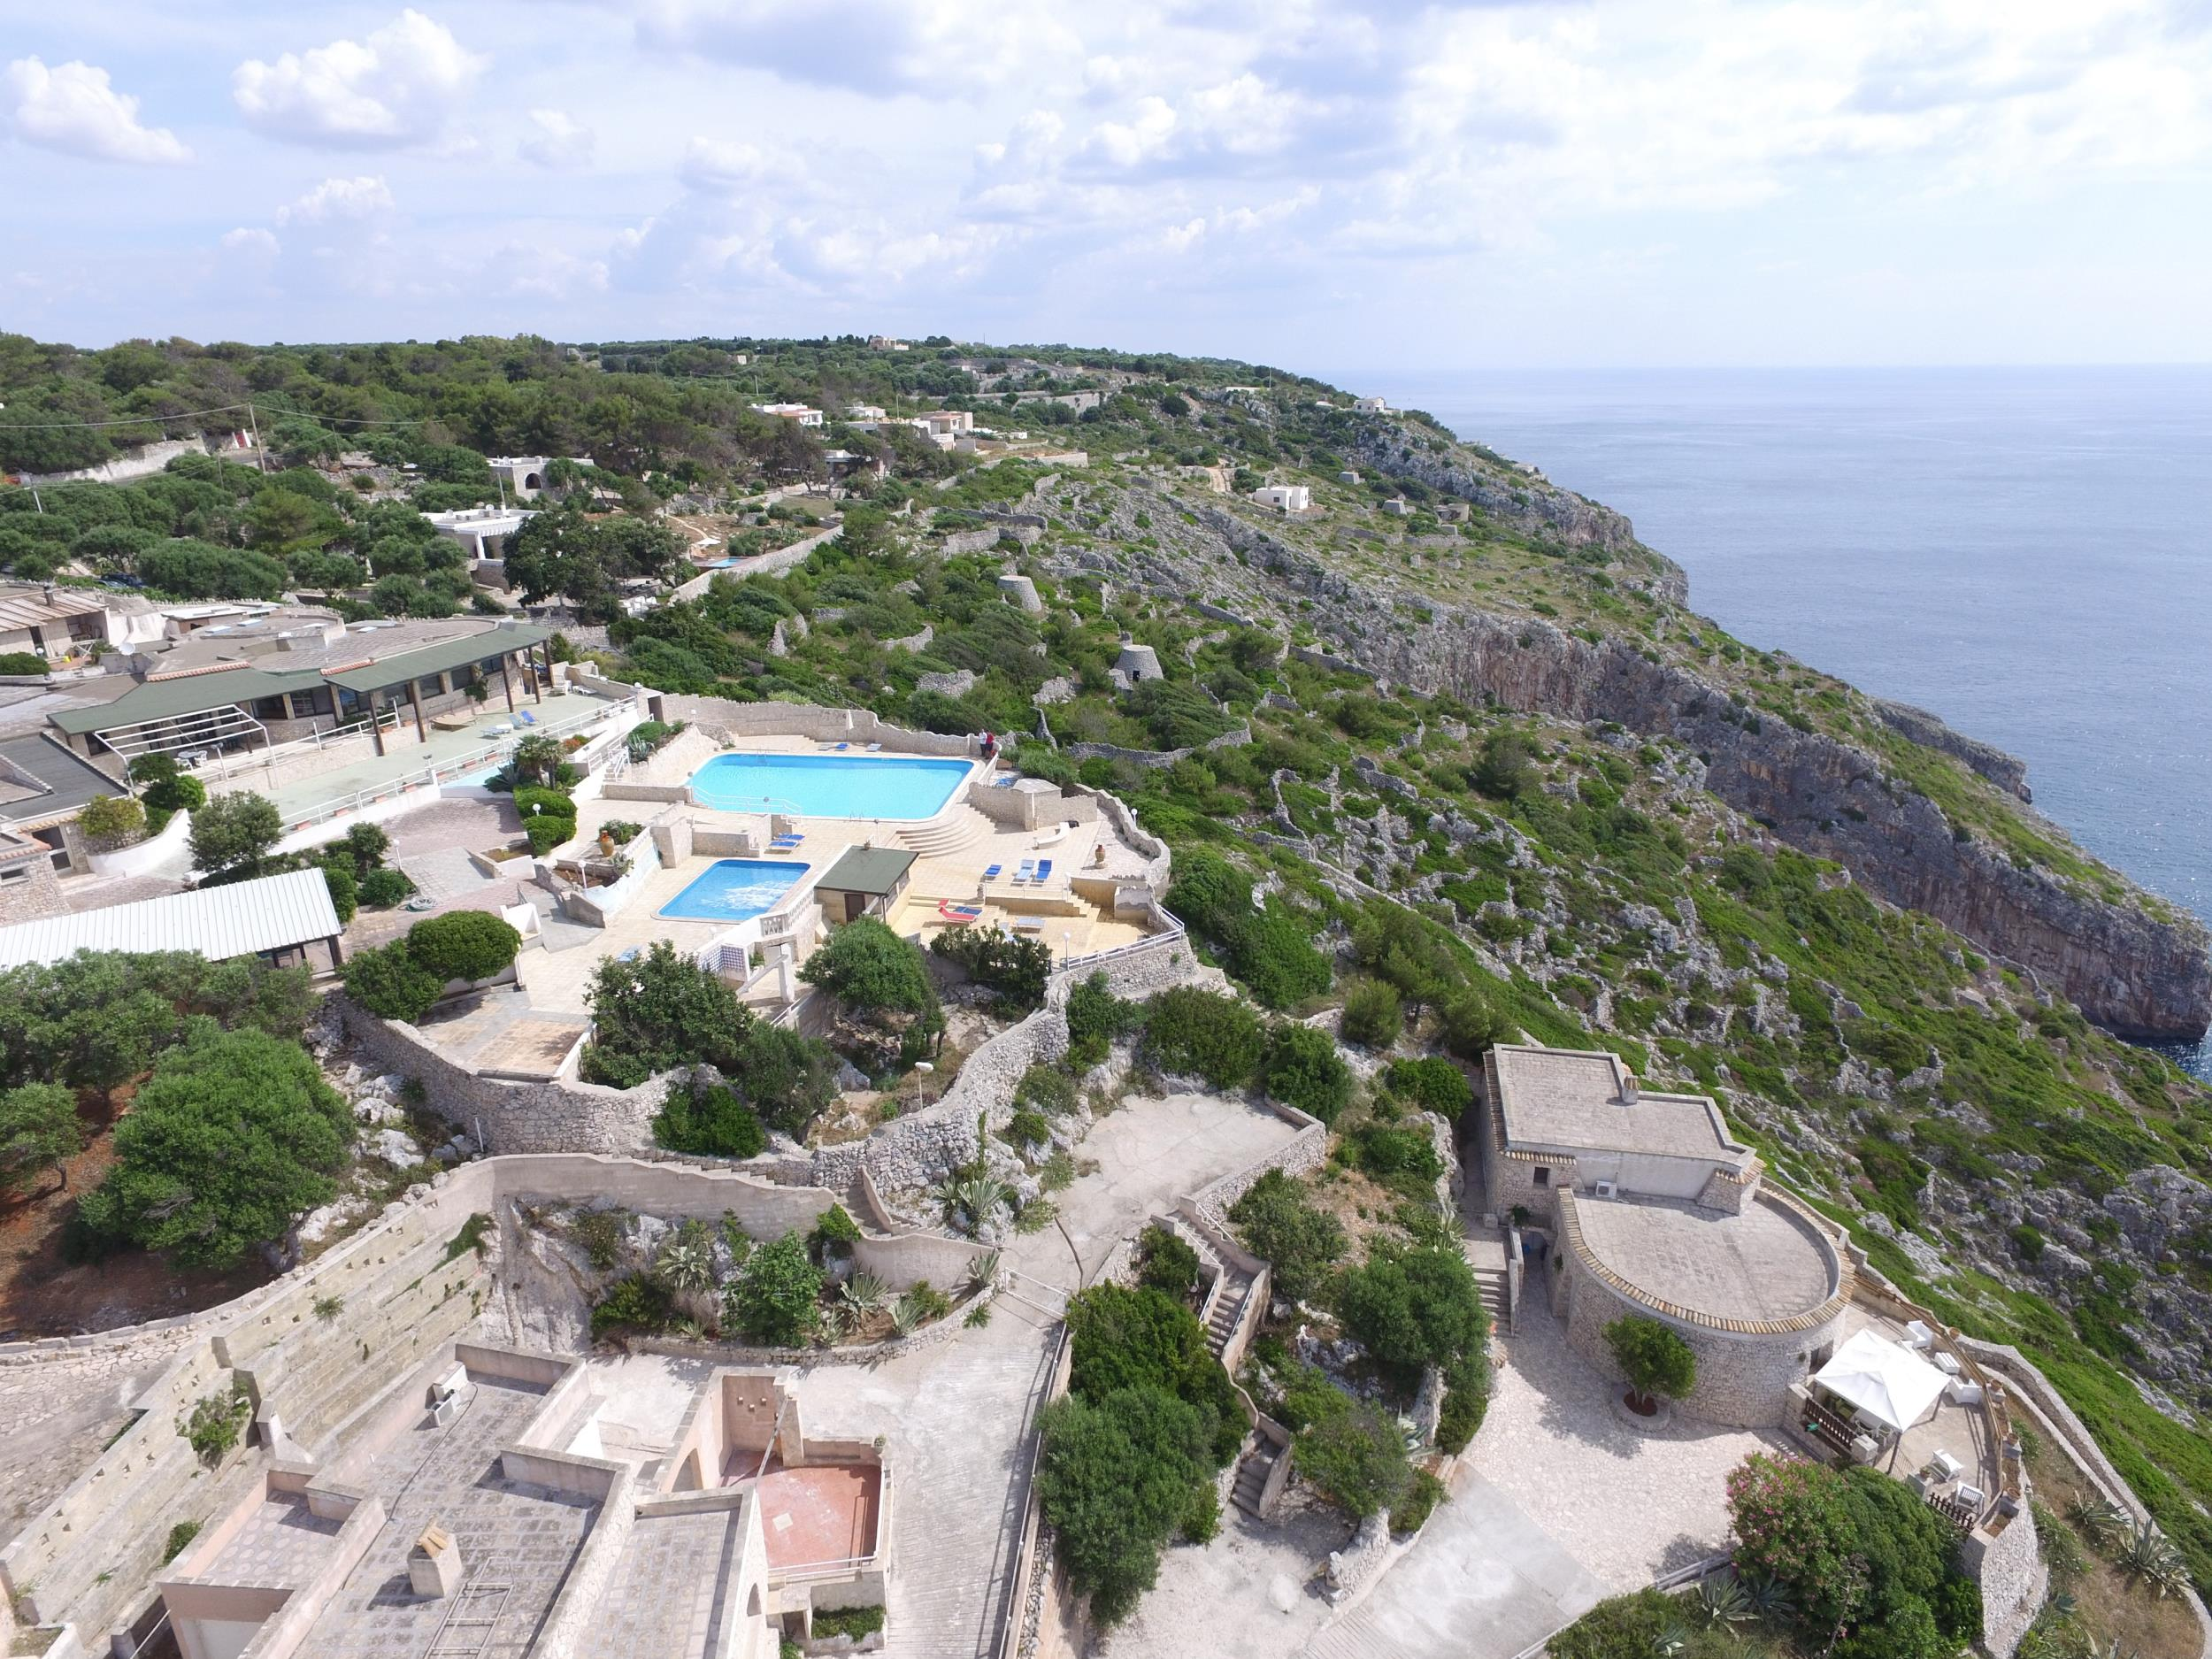 Apartment Archetti pool residence photo 22460067